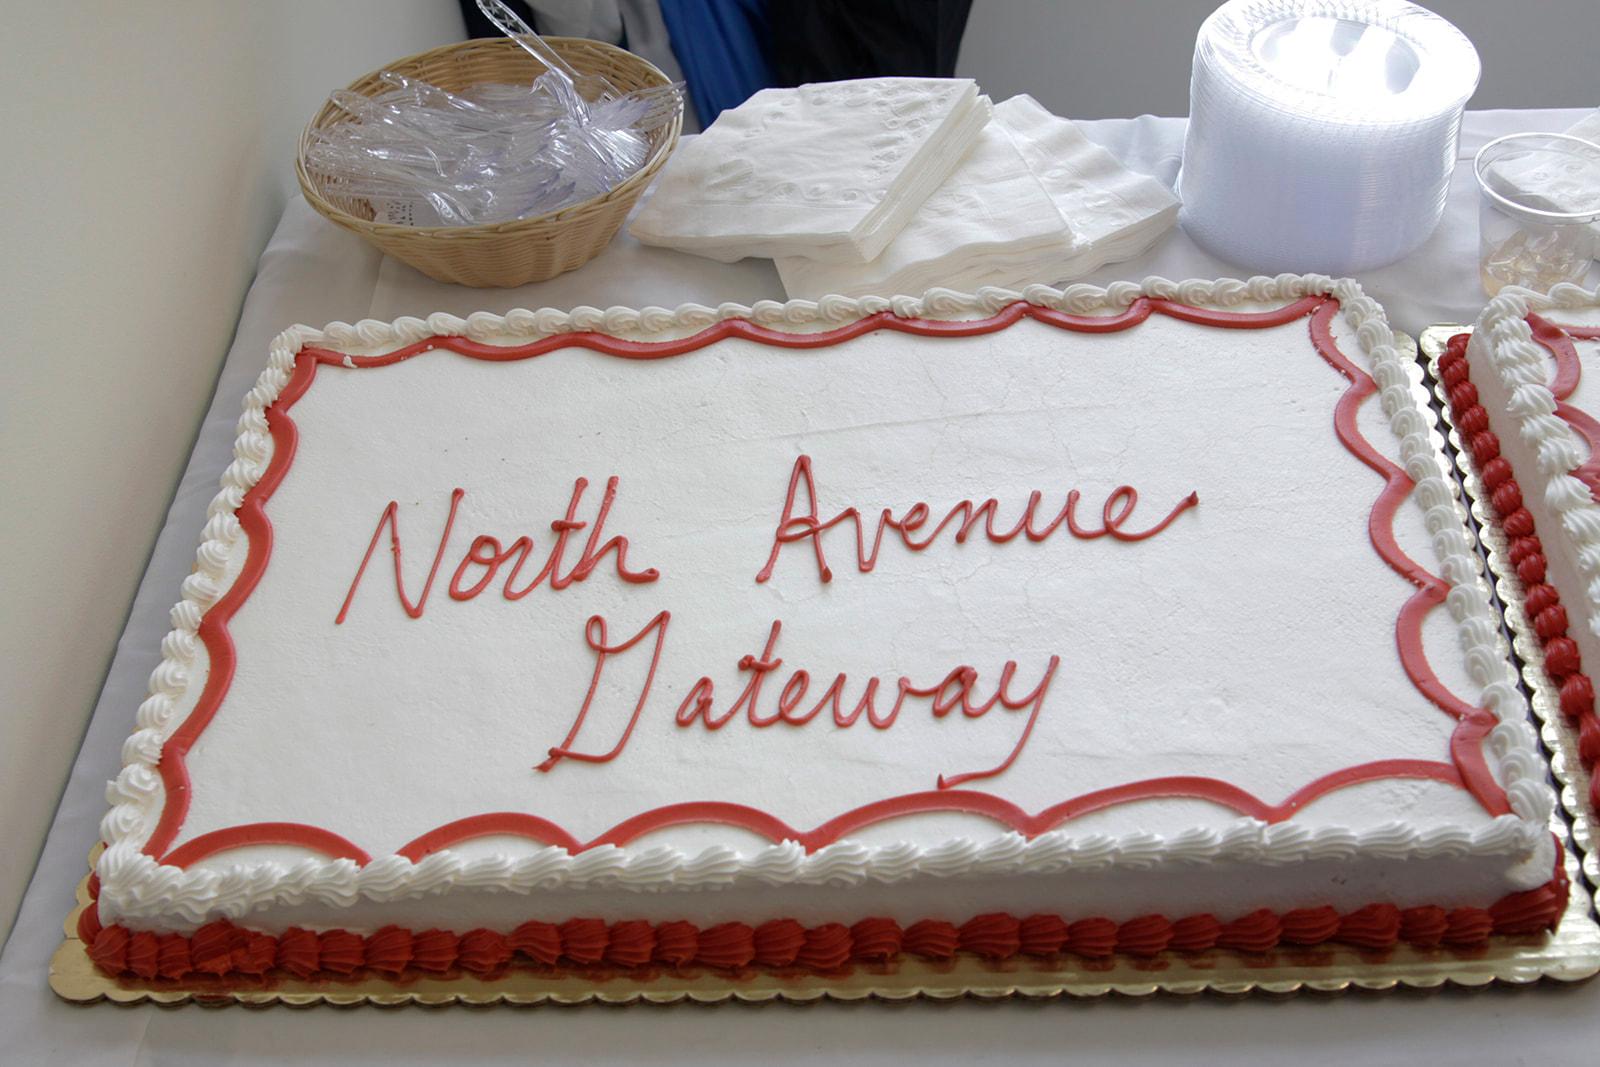 North Ave Gateway123.jpg